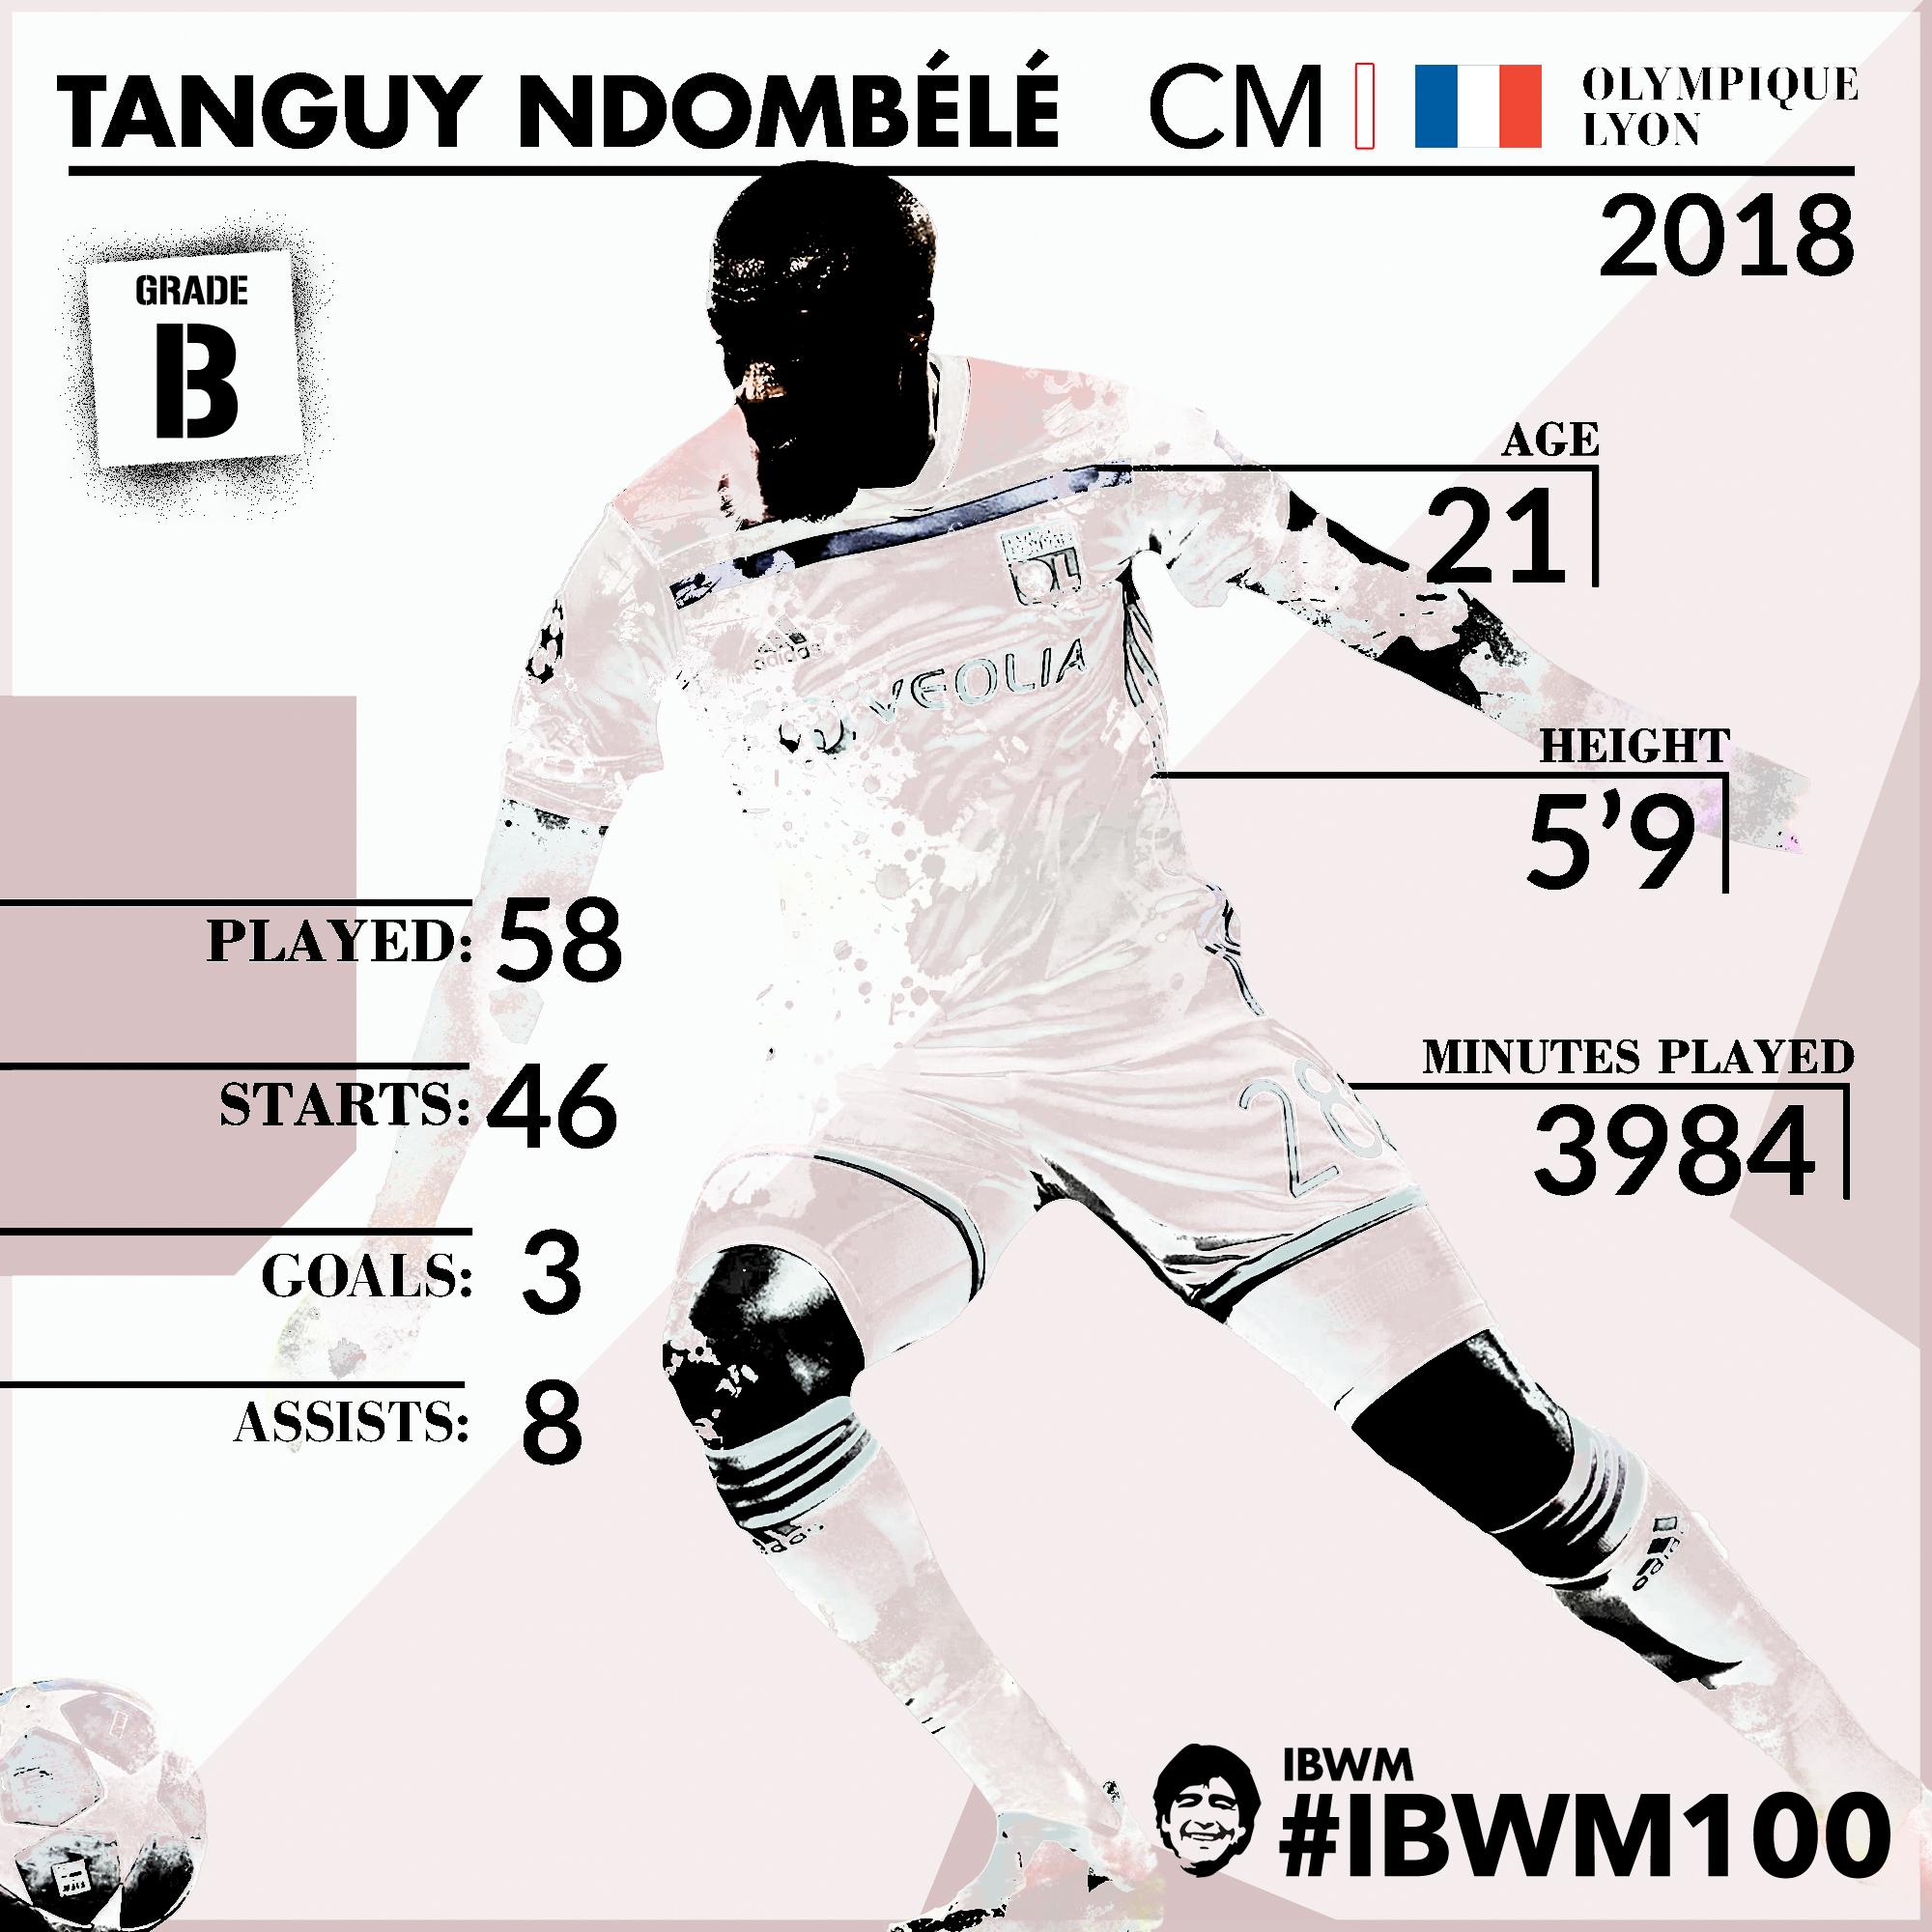 IBWM_-_Tanguy_Ndombele[1].jpg